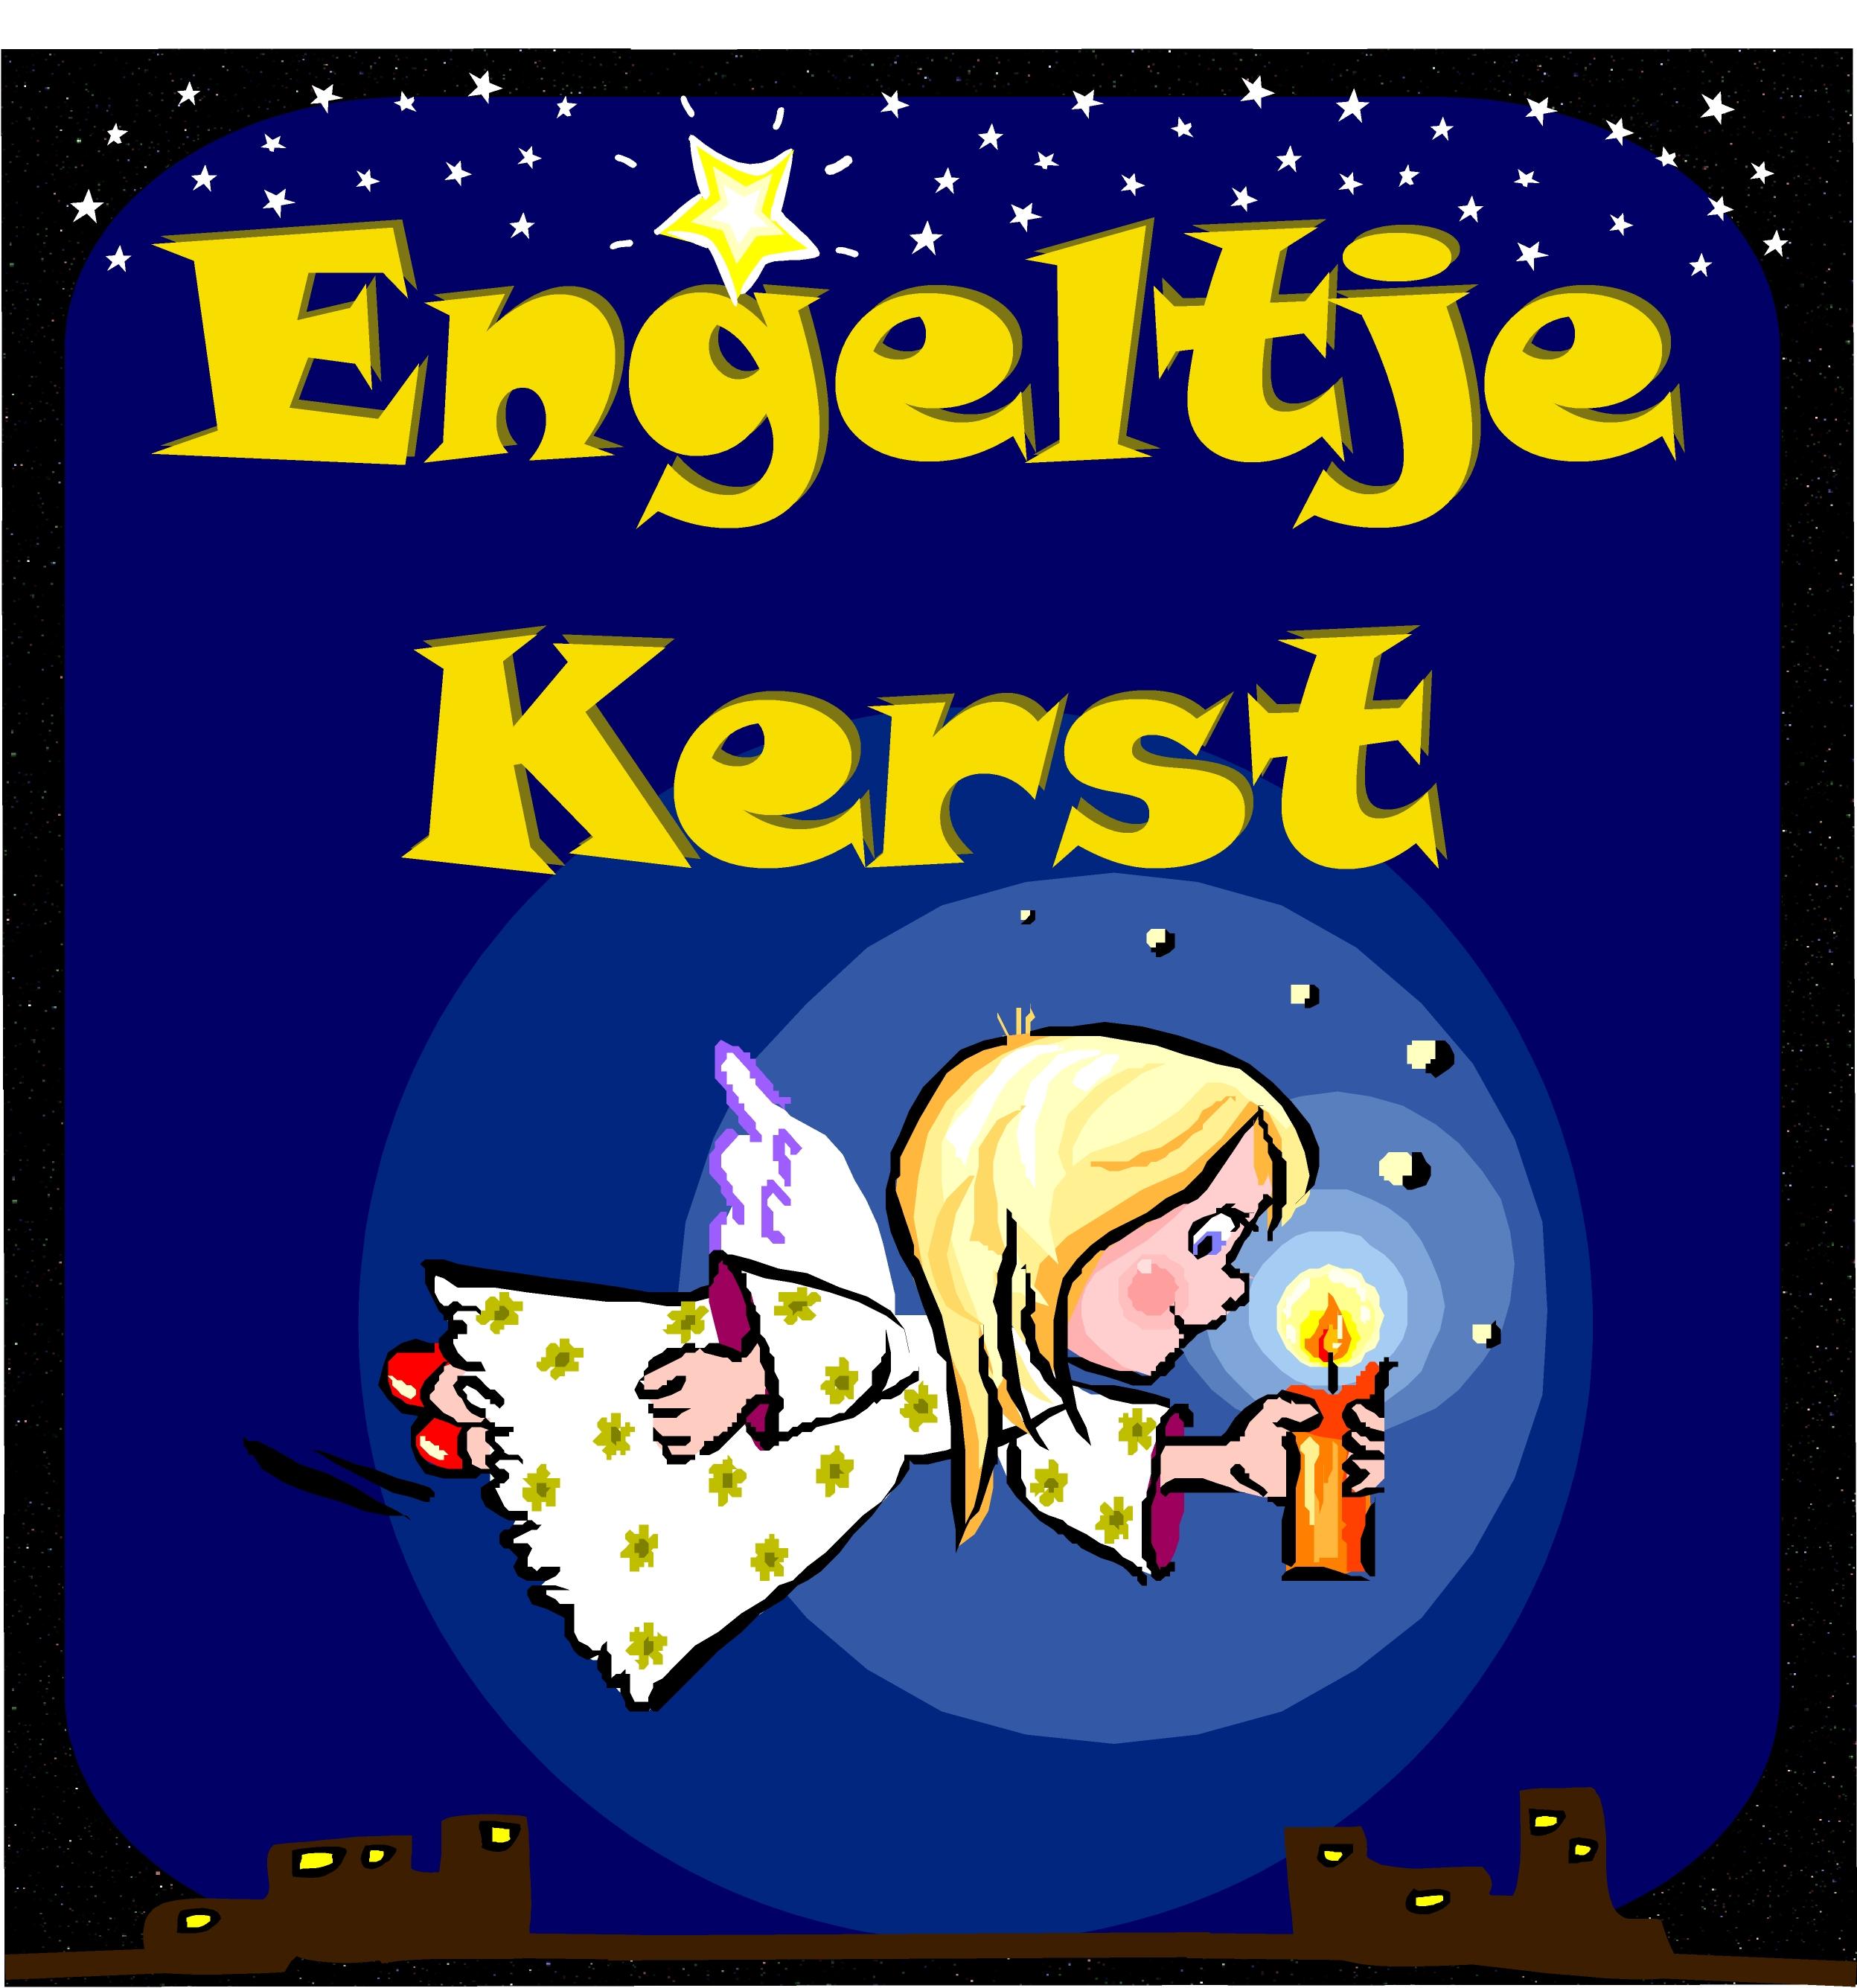 engeltje-kerst-afbeelding